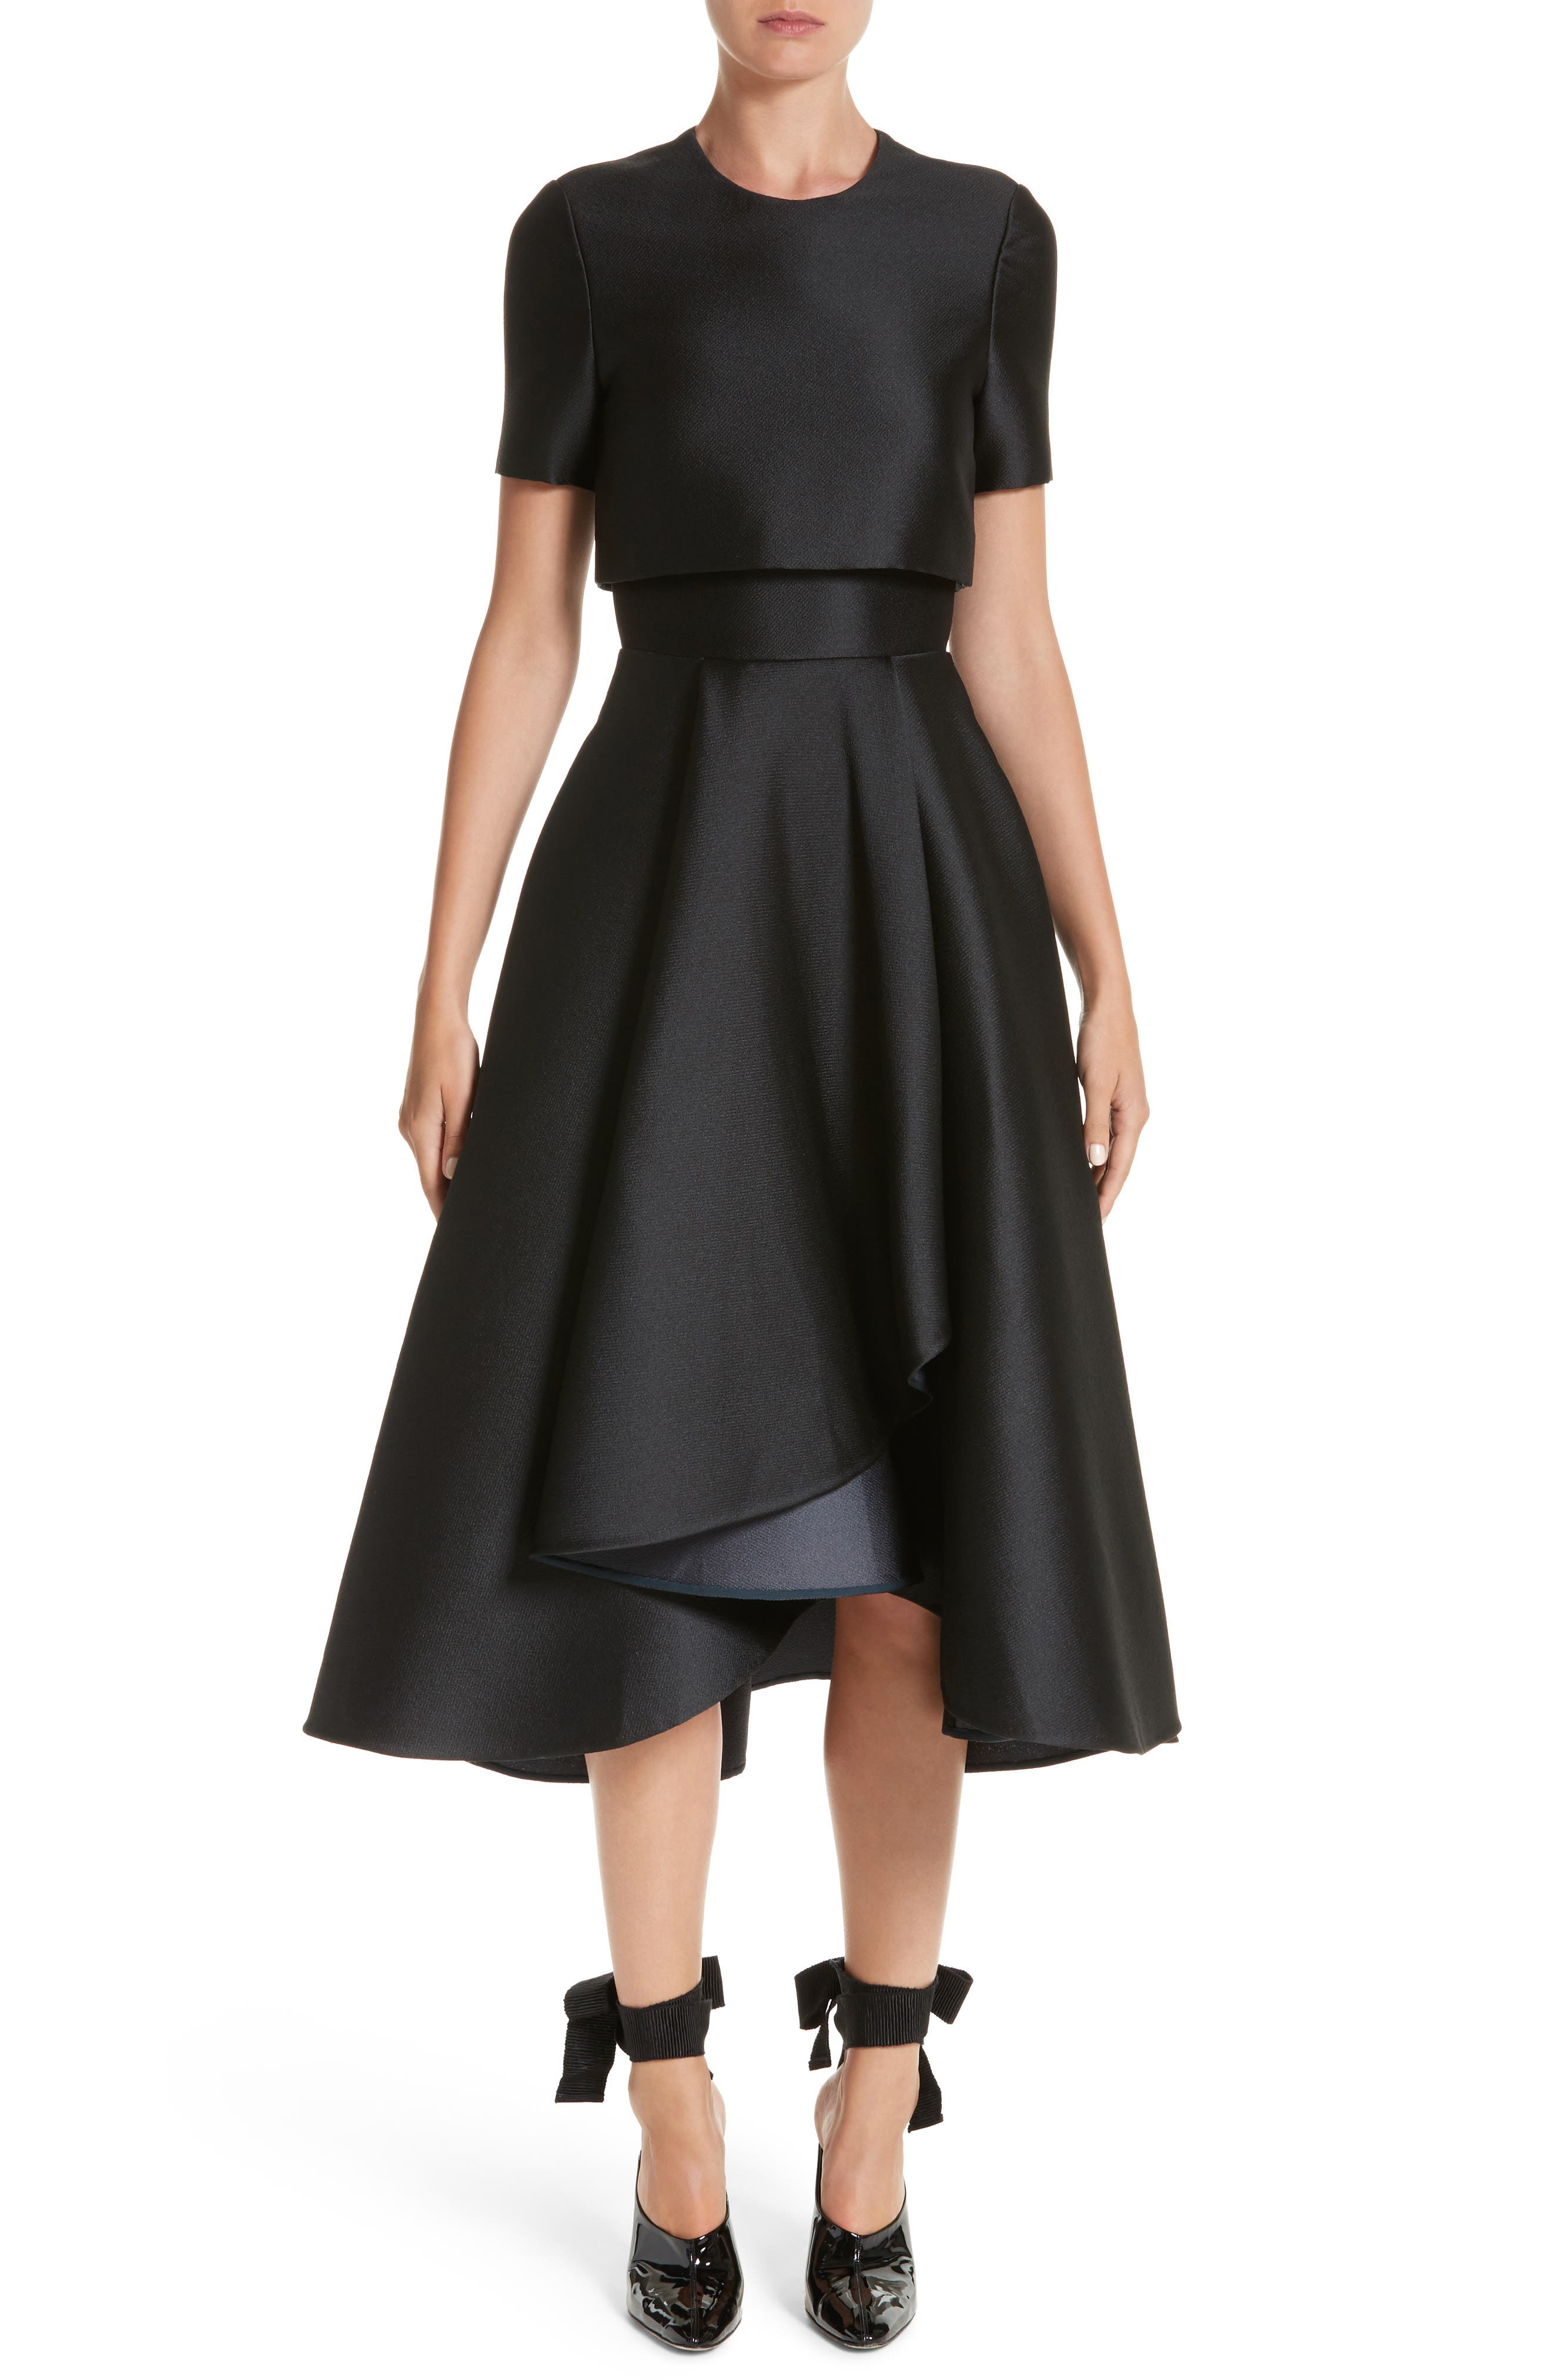 Alternate Image 1 Selected - Jason Wu Popover Fit & Flare Dress